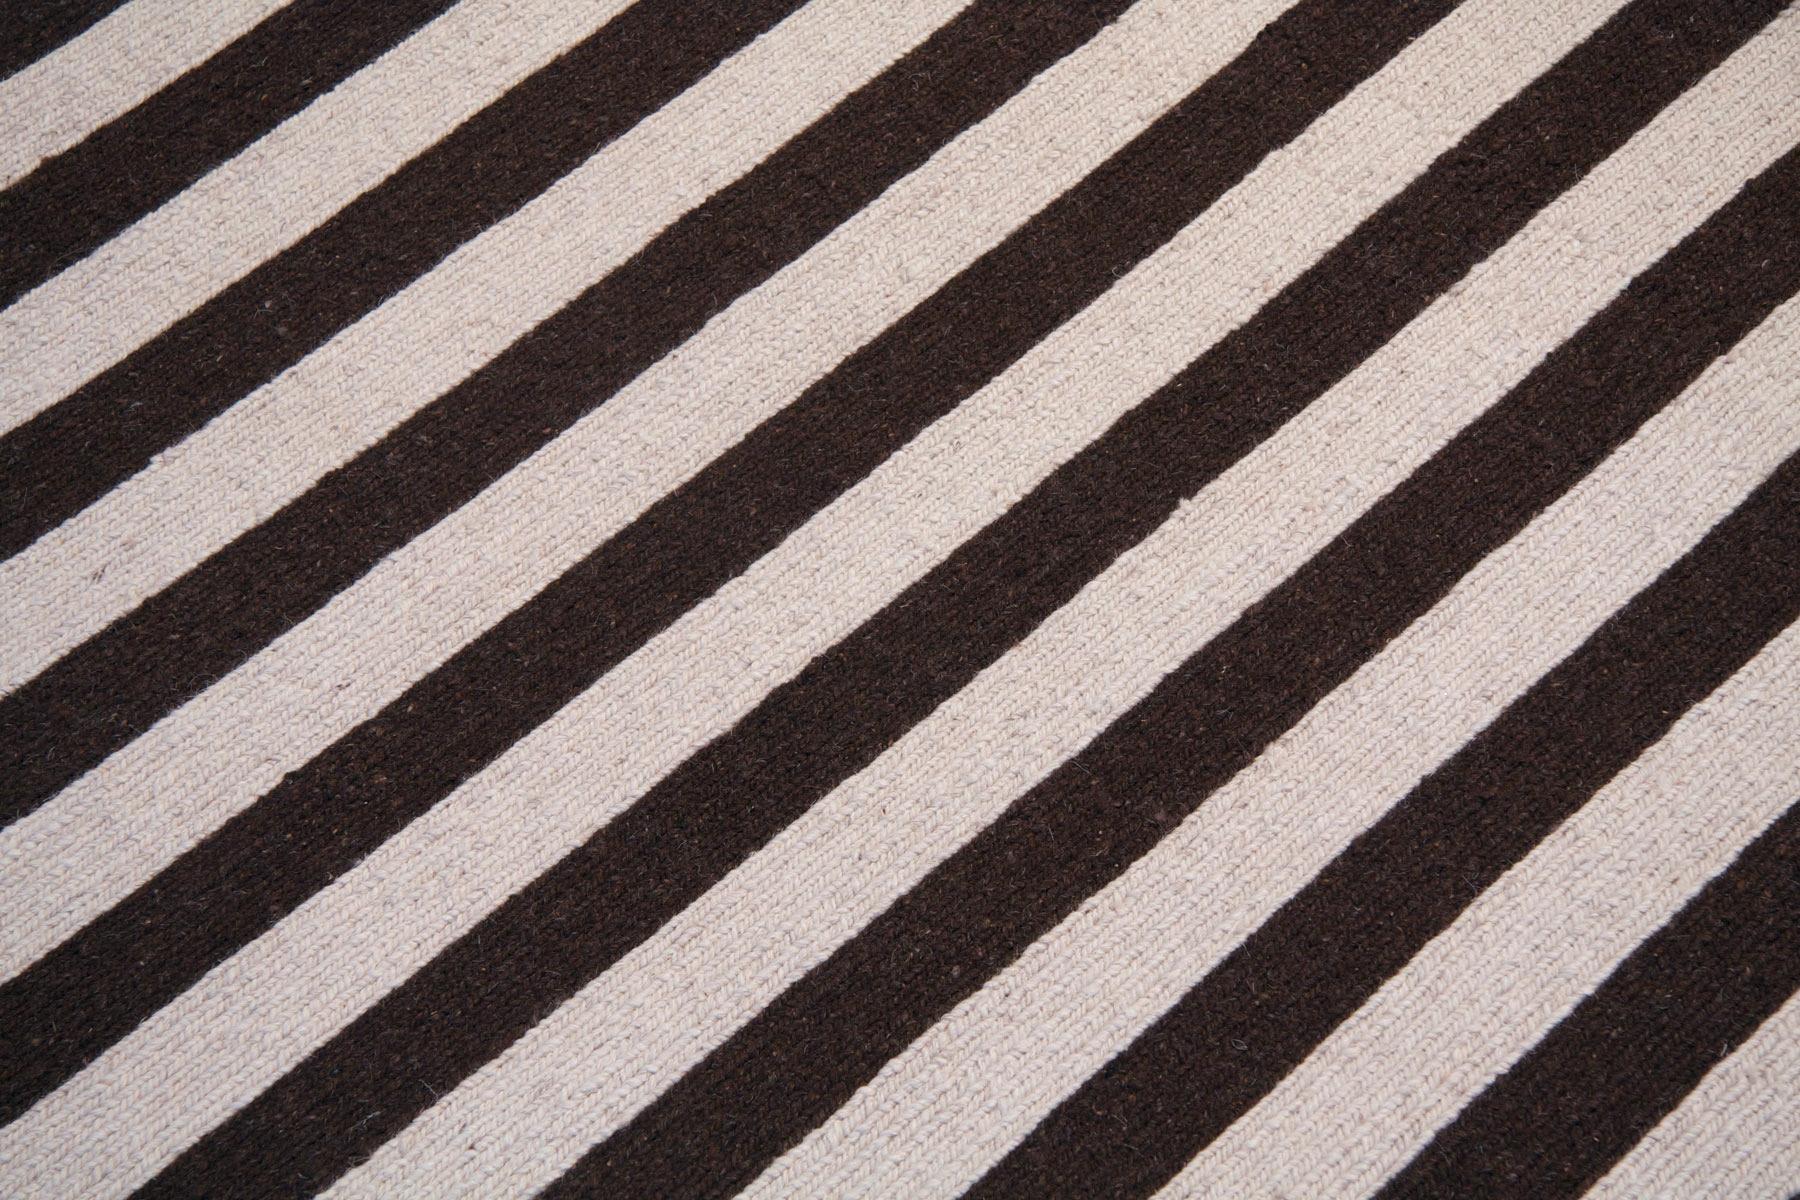 Carini Lang's Sumak stripes